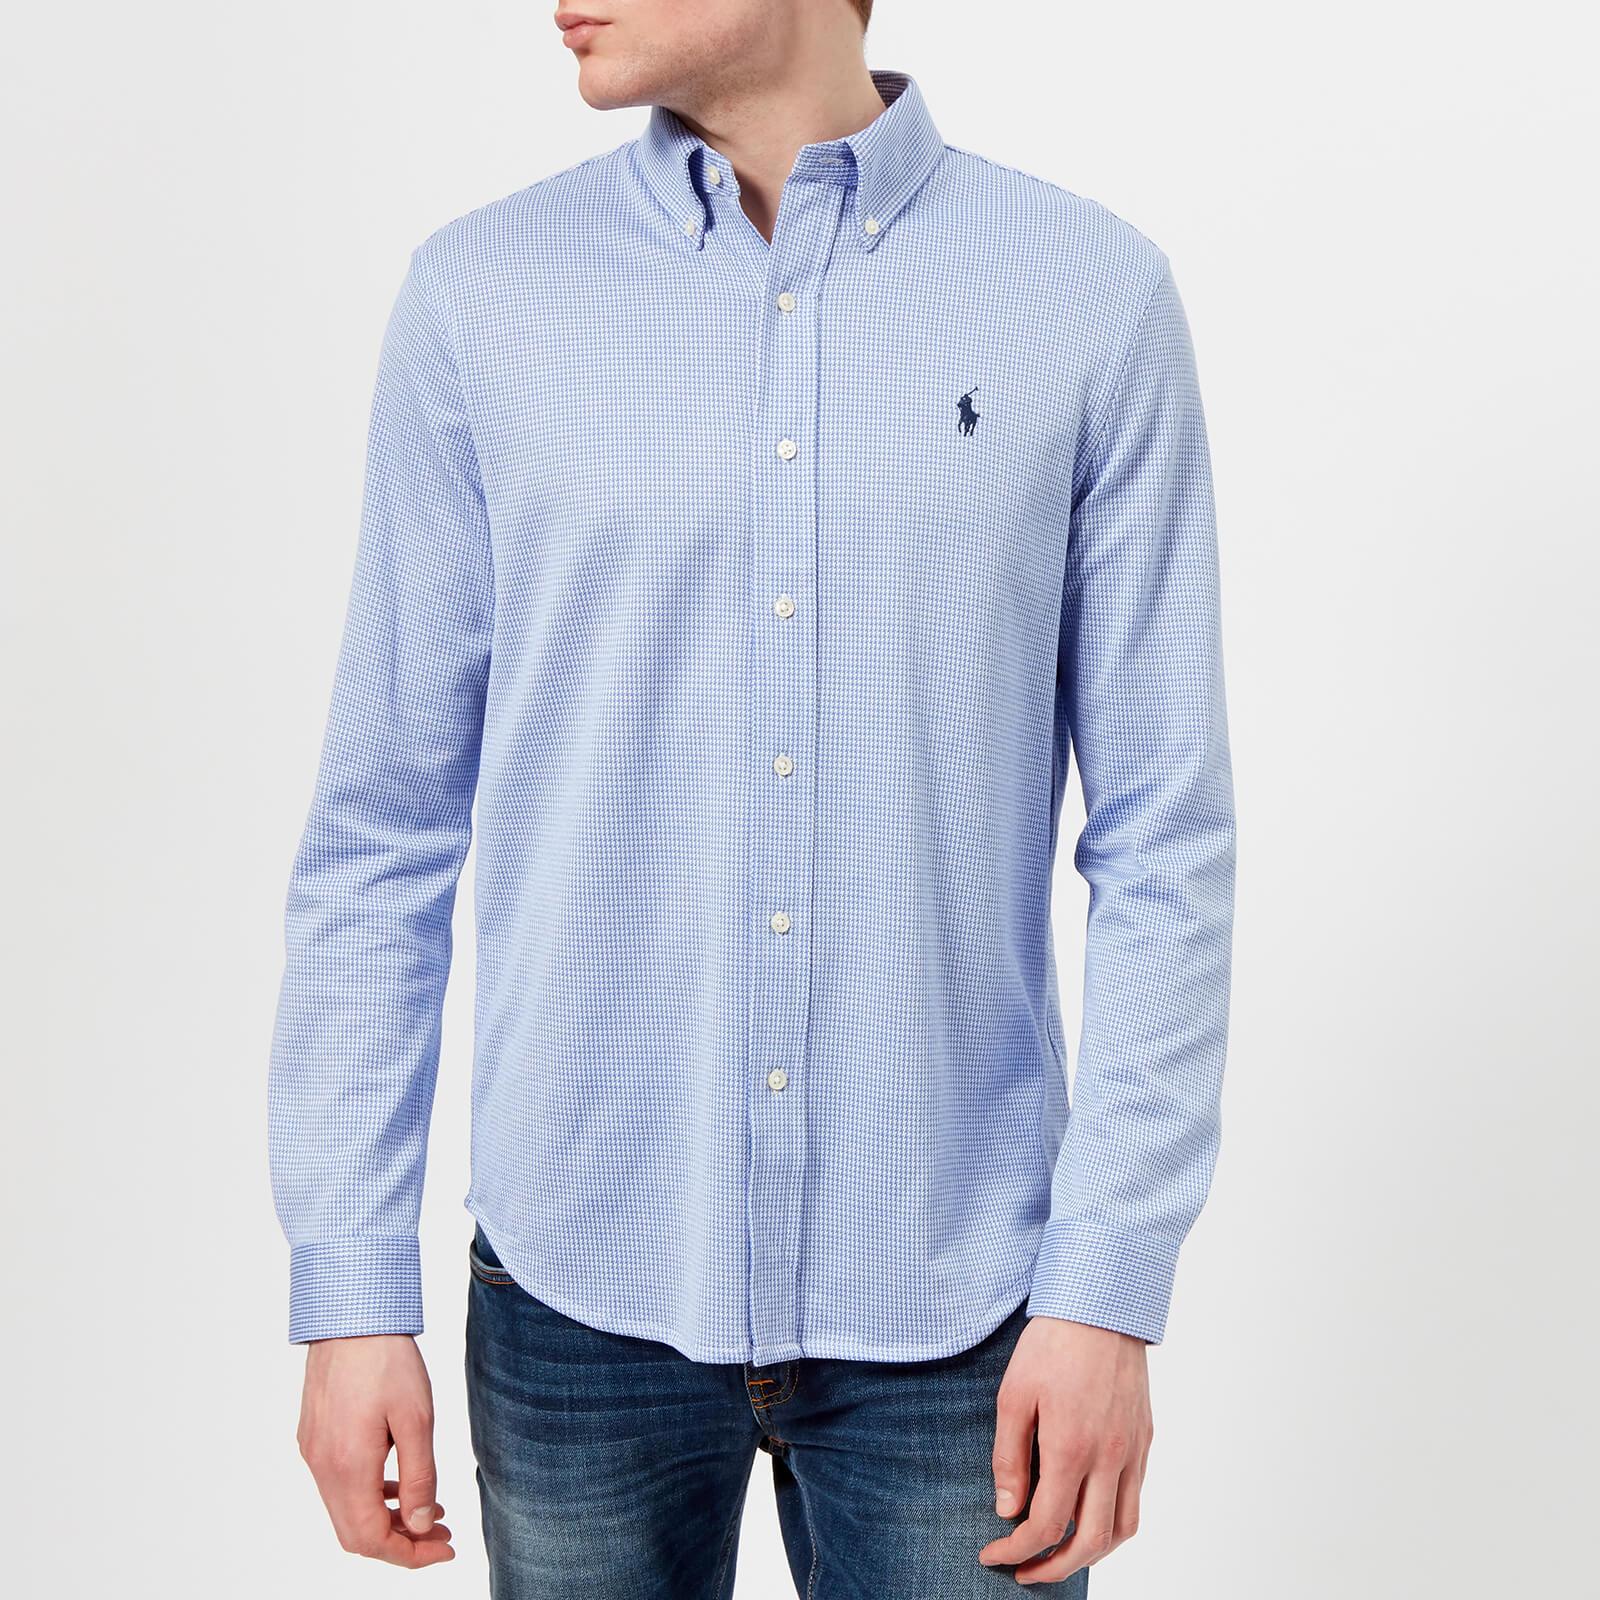 Polo Ralph Lauren Mens Long Sleeve Oxford Pique Shirt Stratford